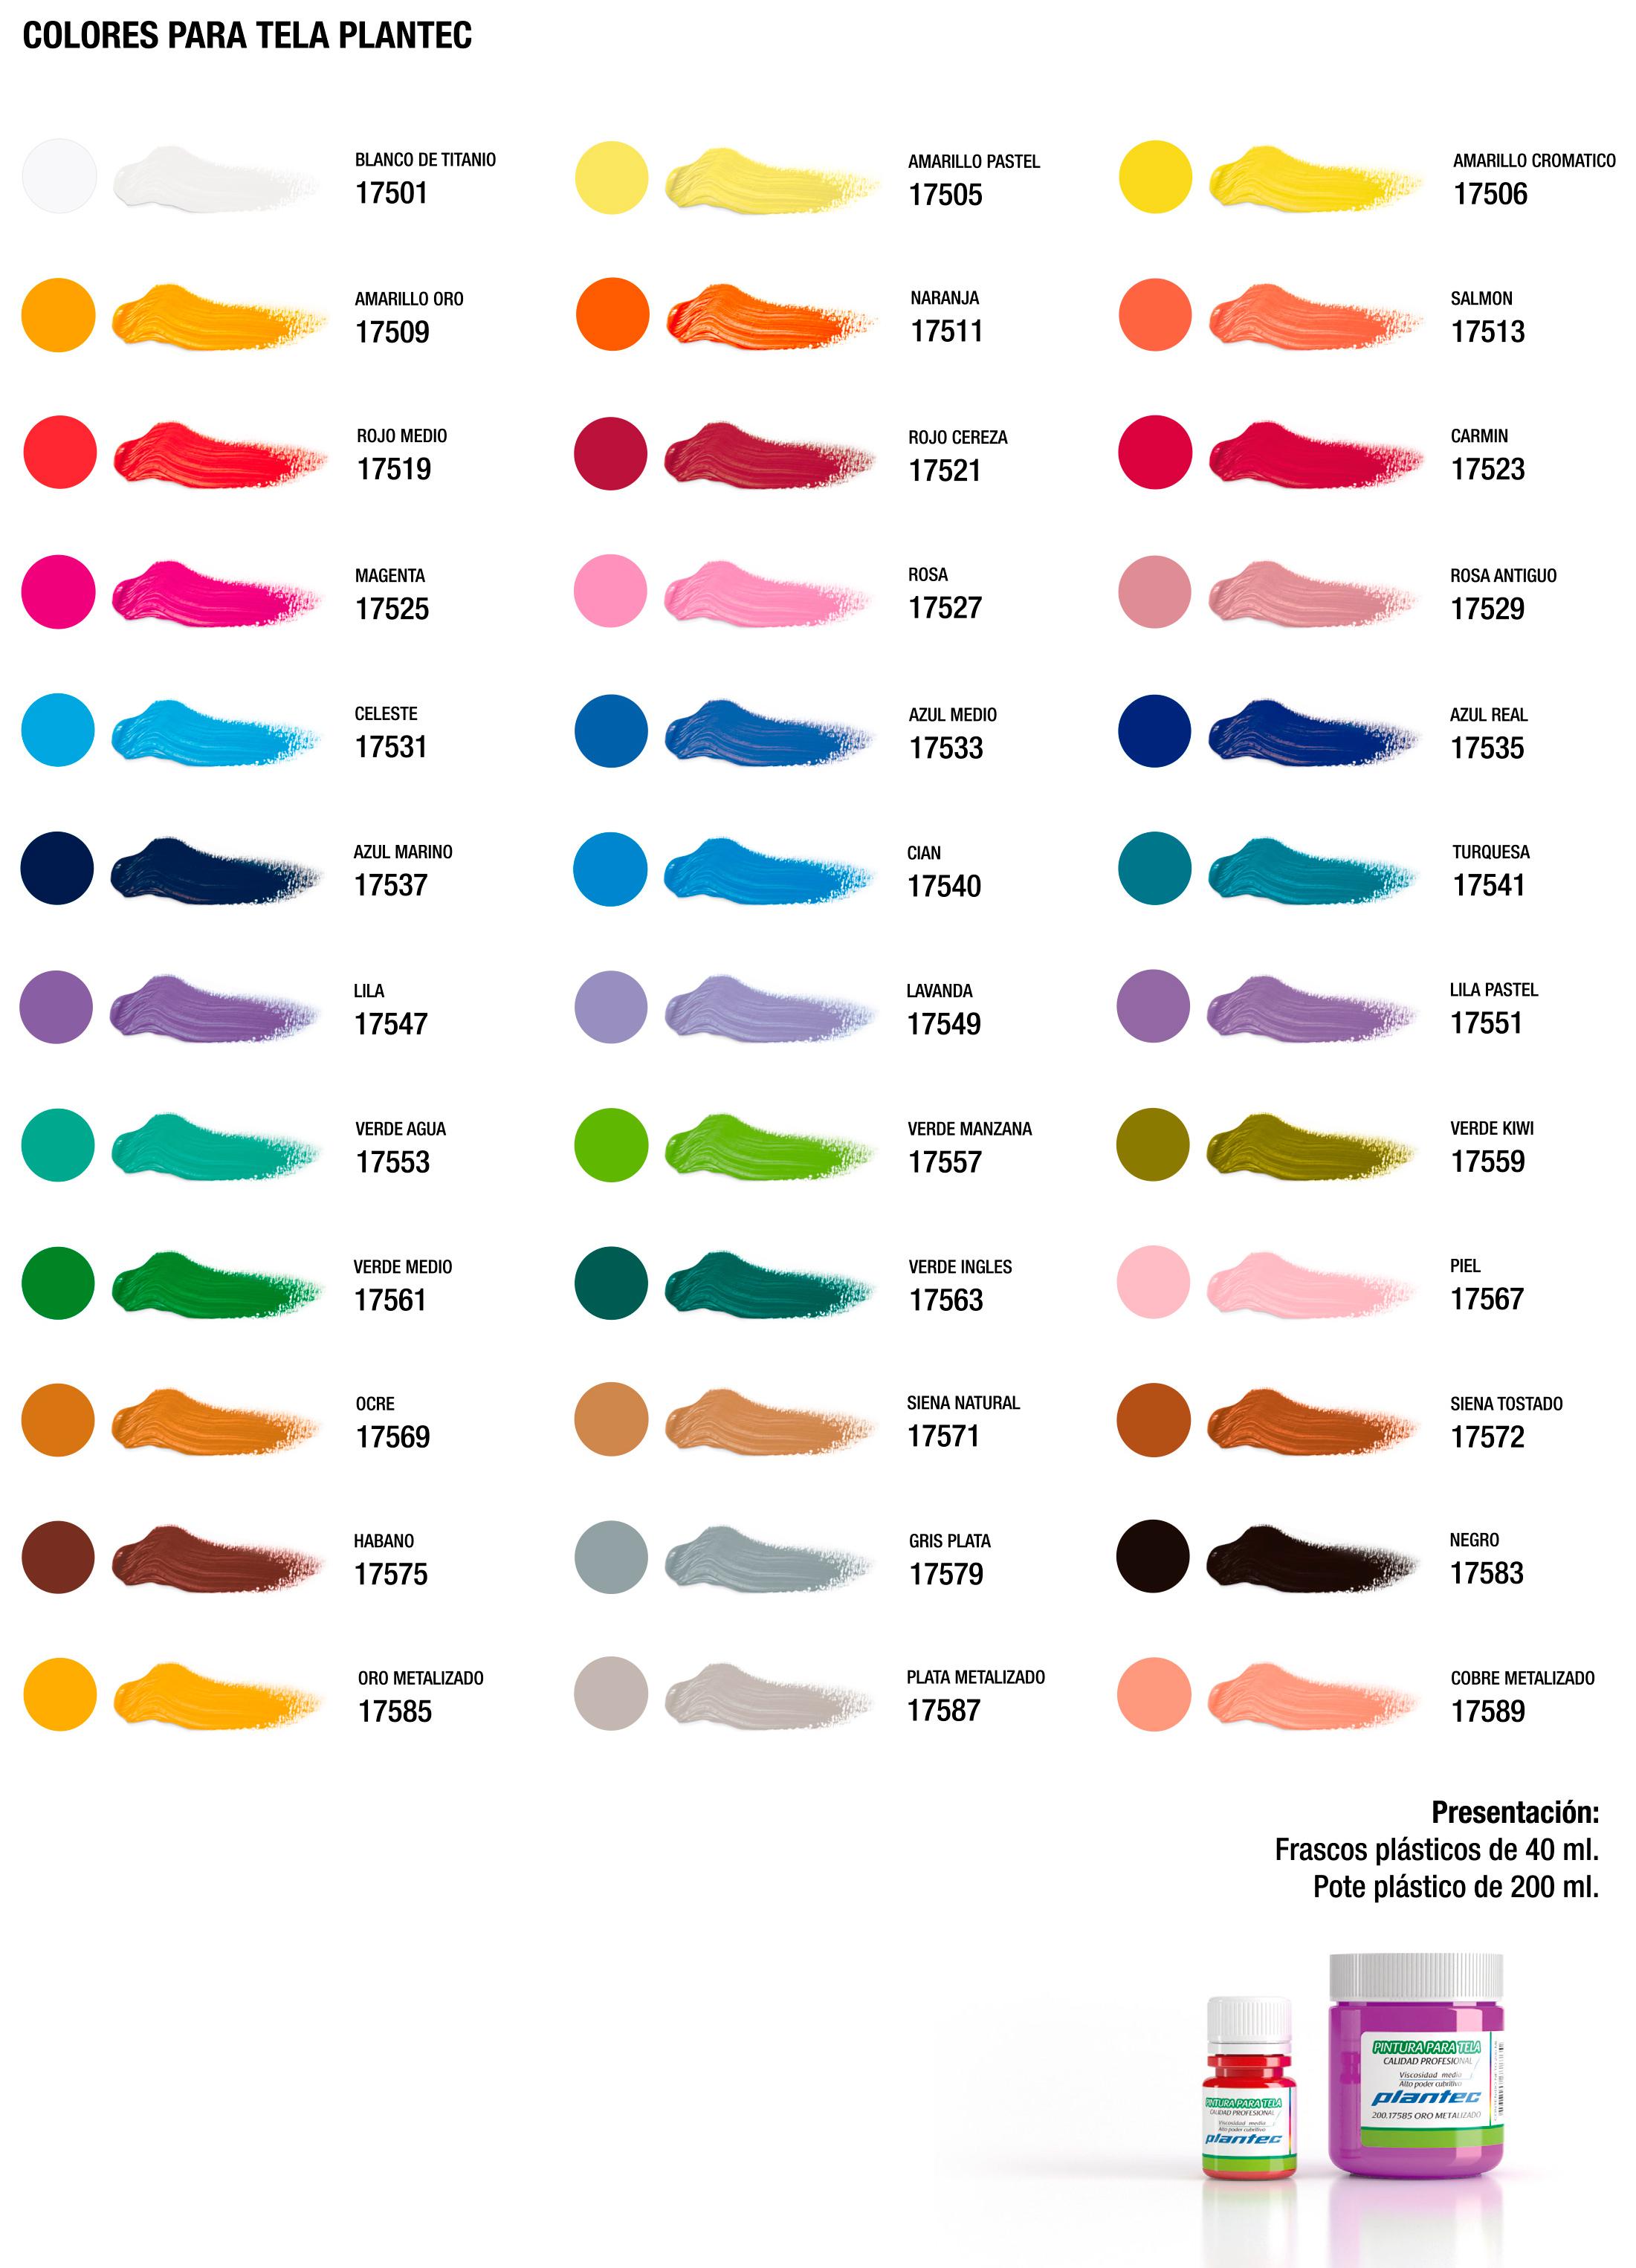 colores-pintura-para-tela-plantec